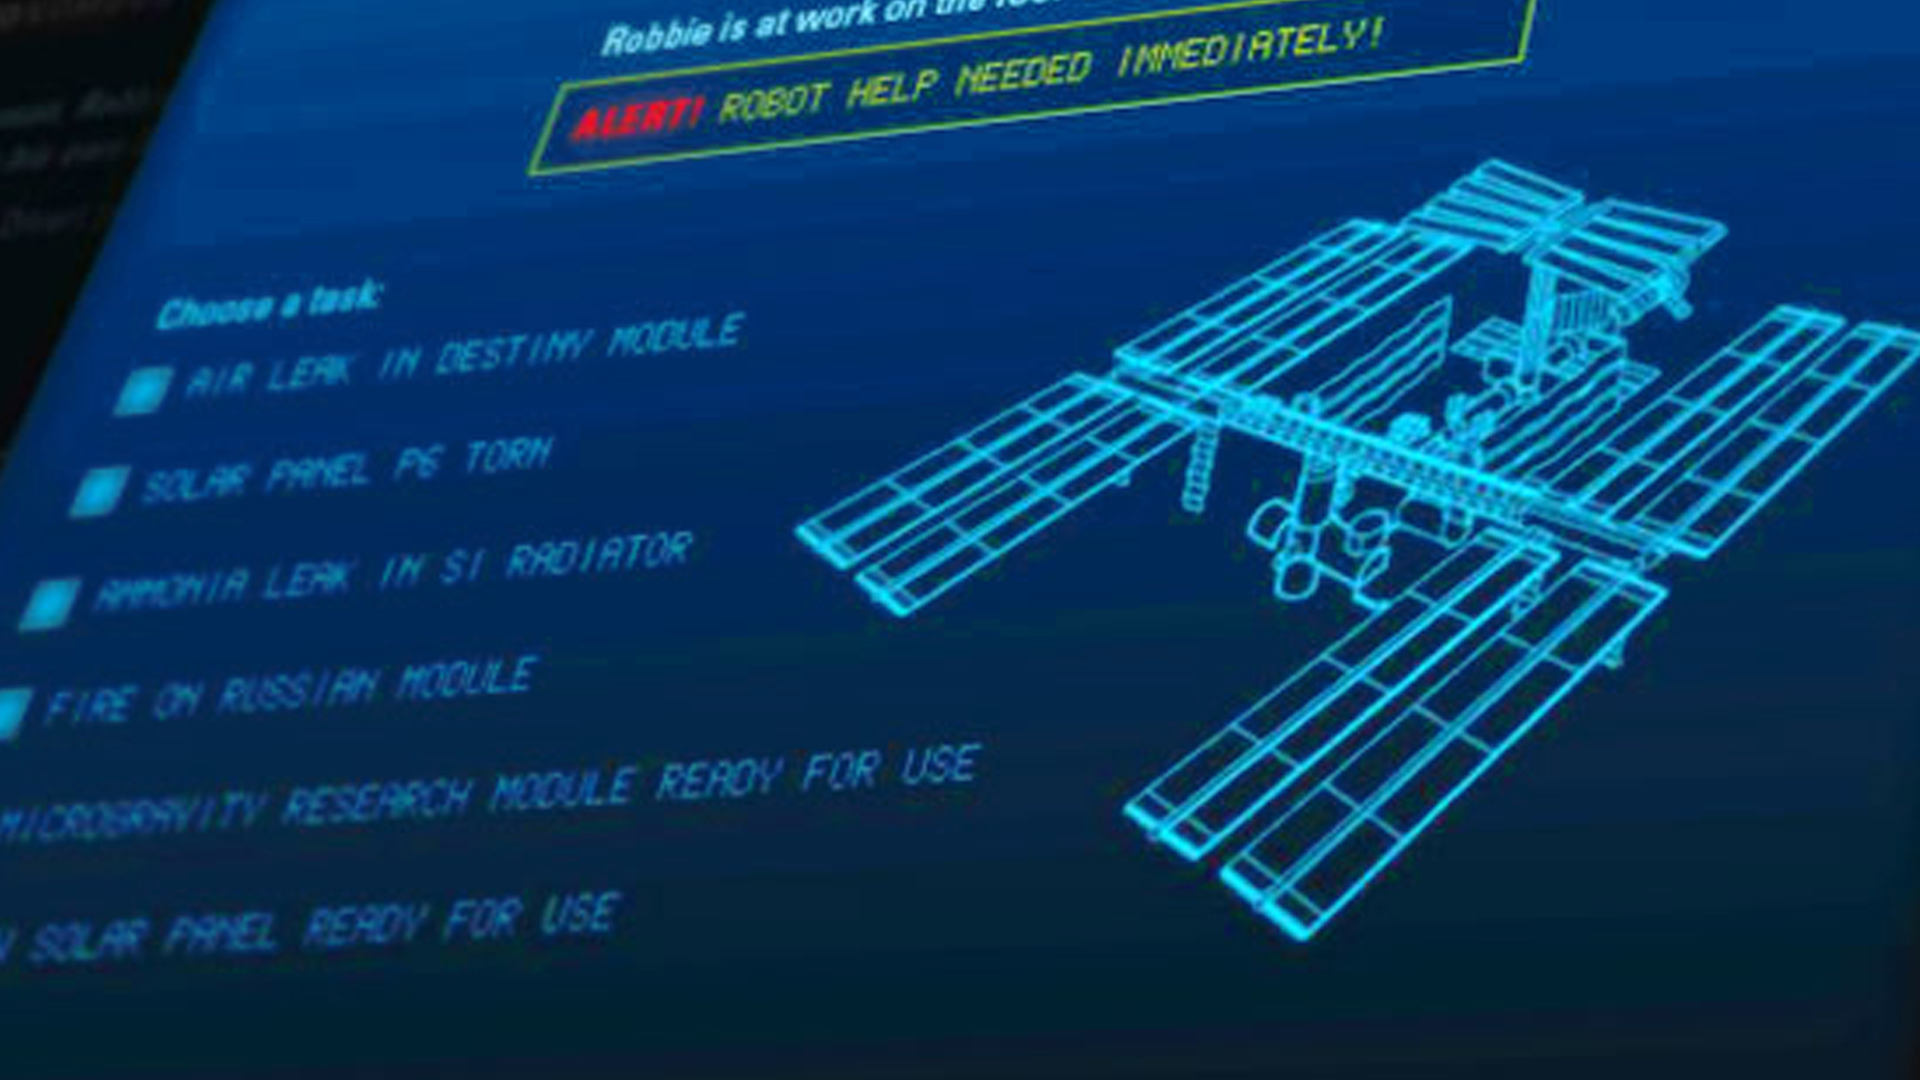 robots-7.jpg